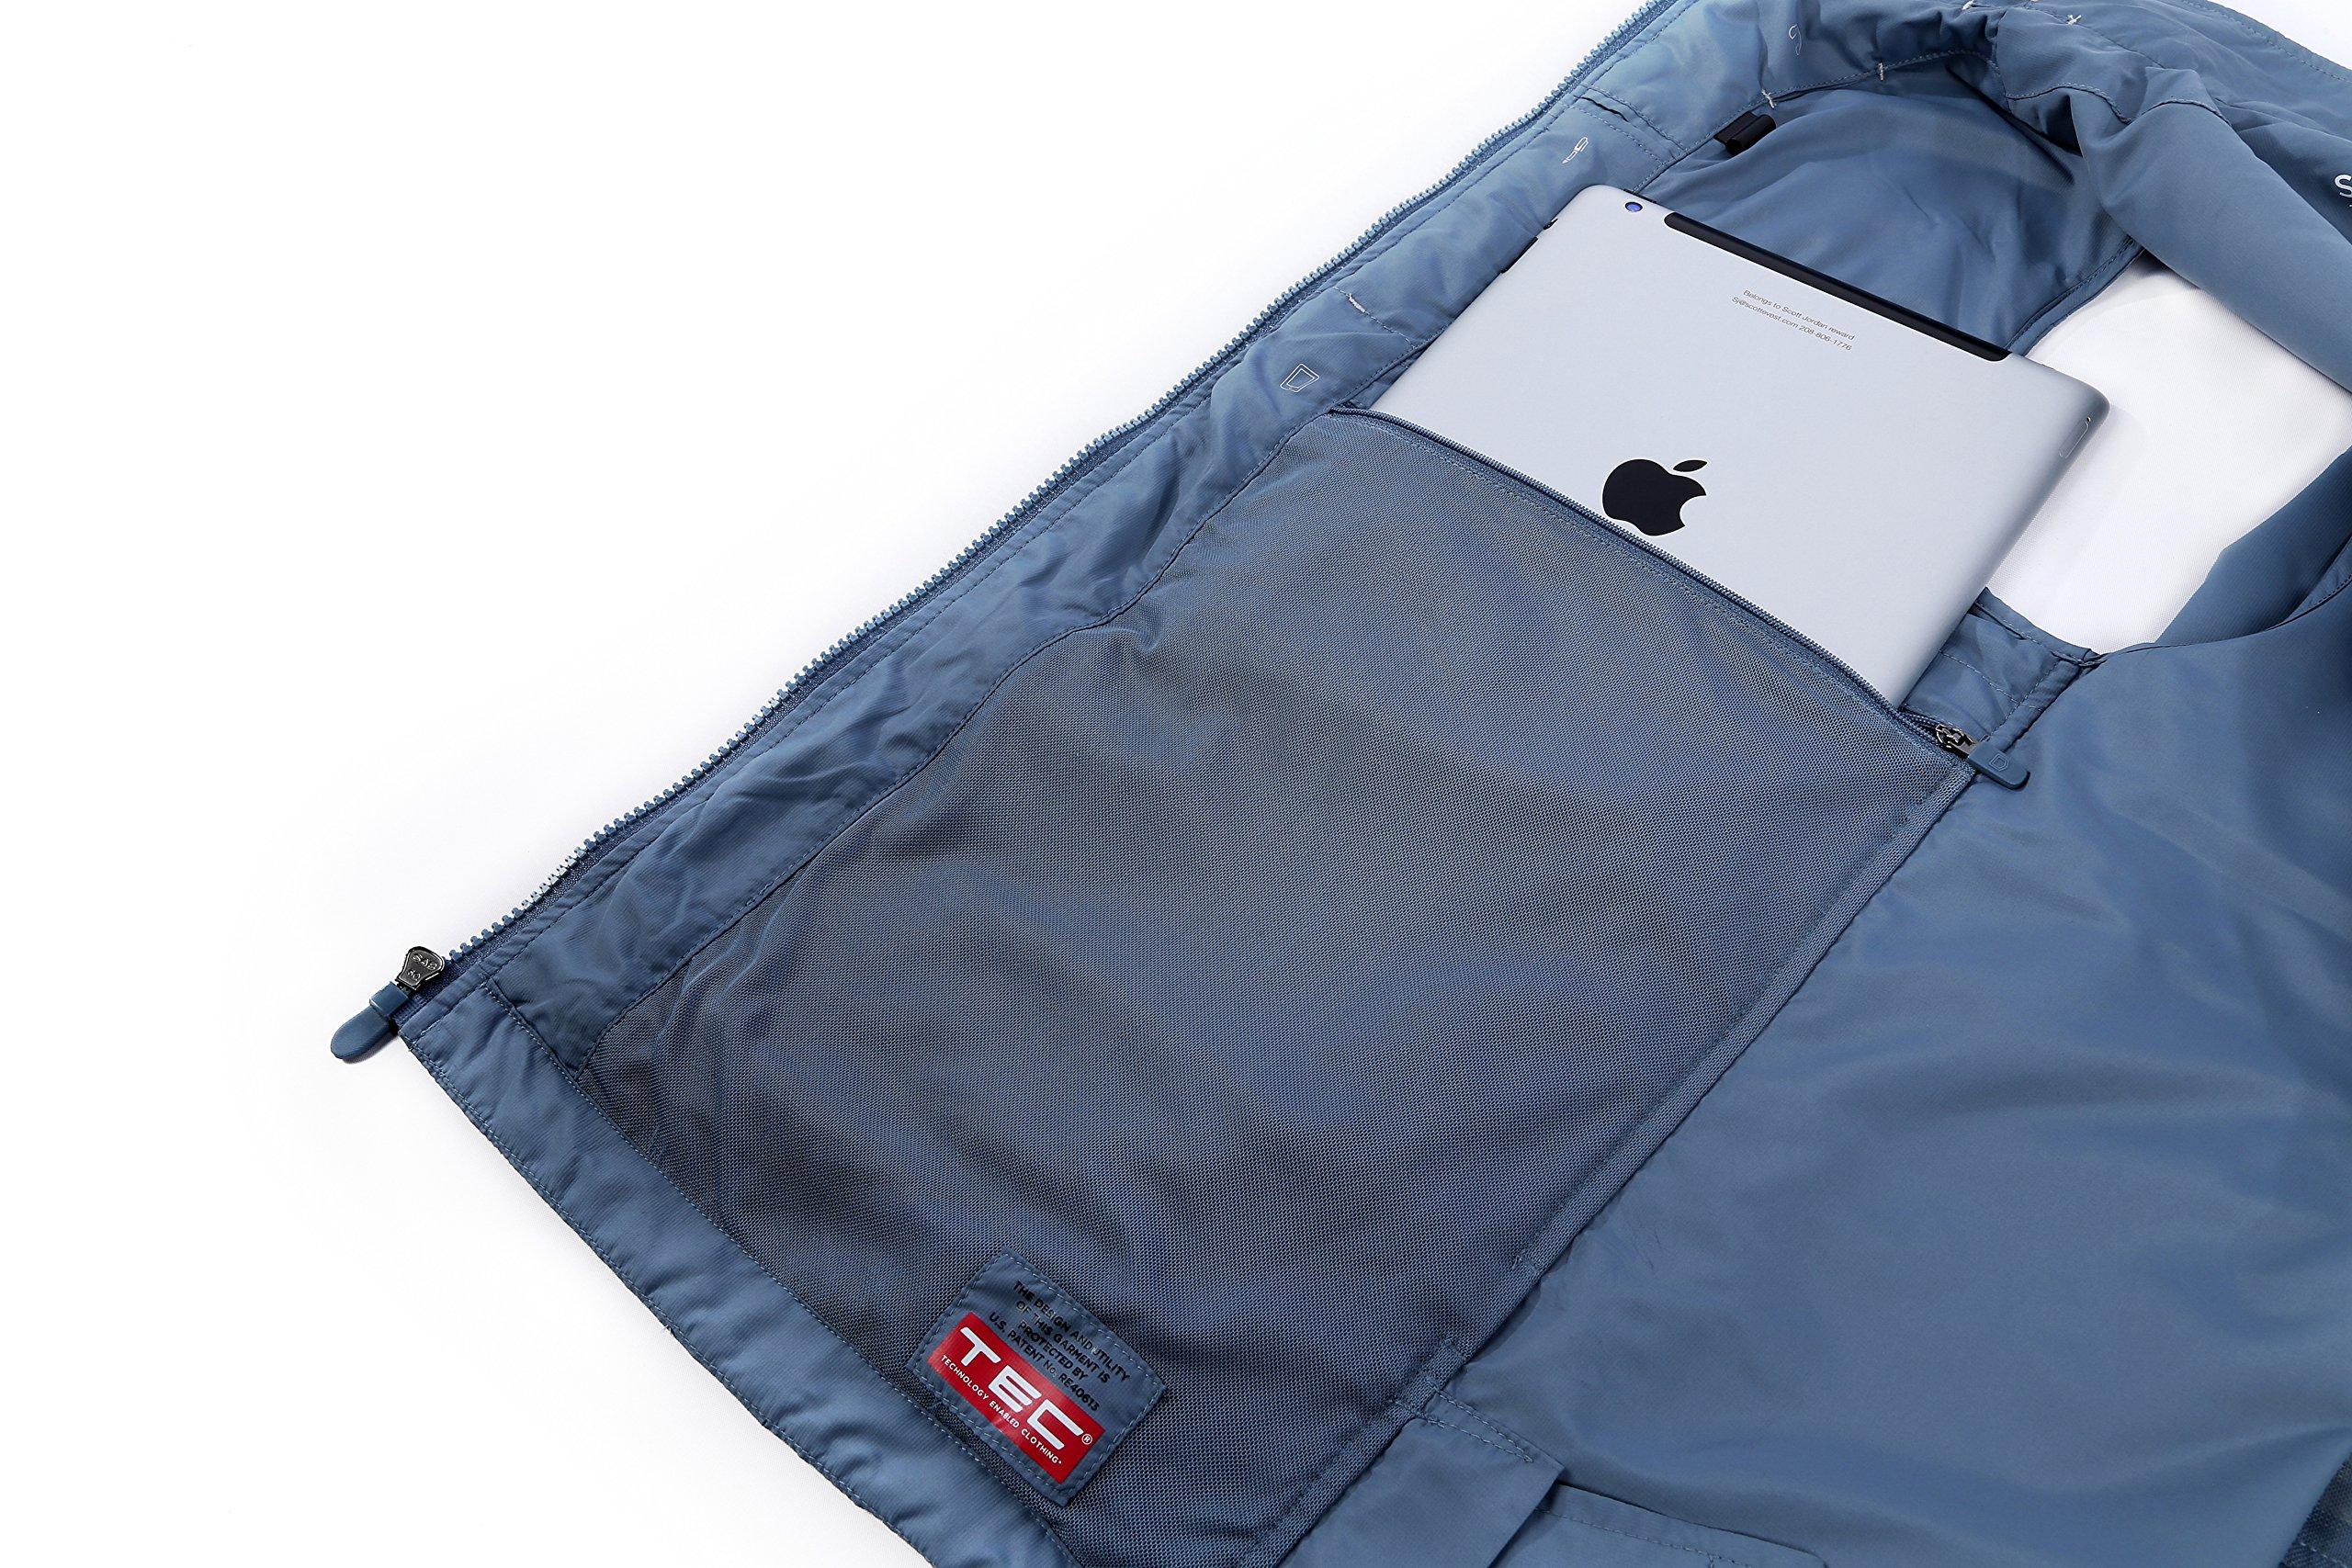 SCOTTeVEST Men's Featherweight Vest - 14 Pockets - Travel Clothing CMT L by SCOTTeVEST (Image #6)